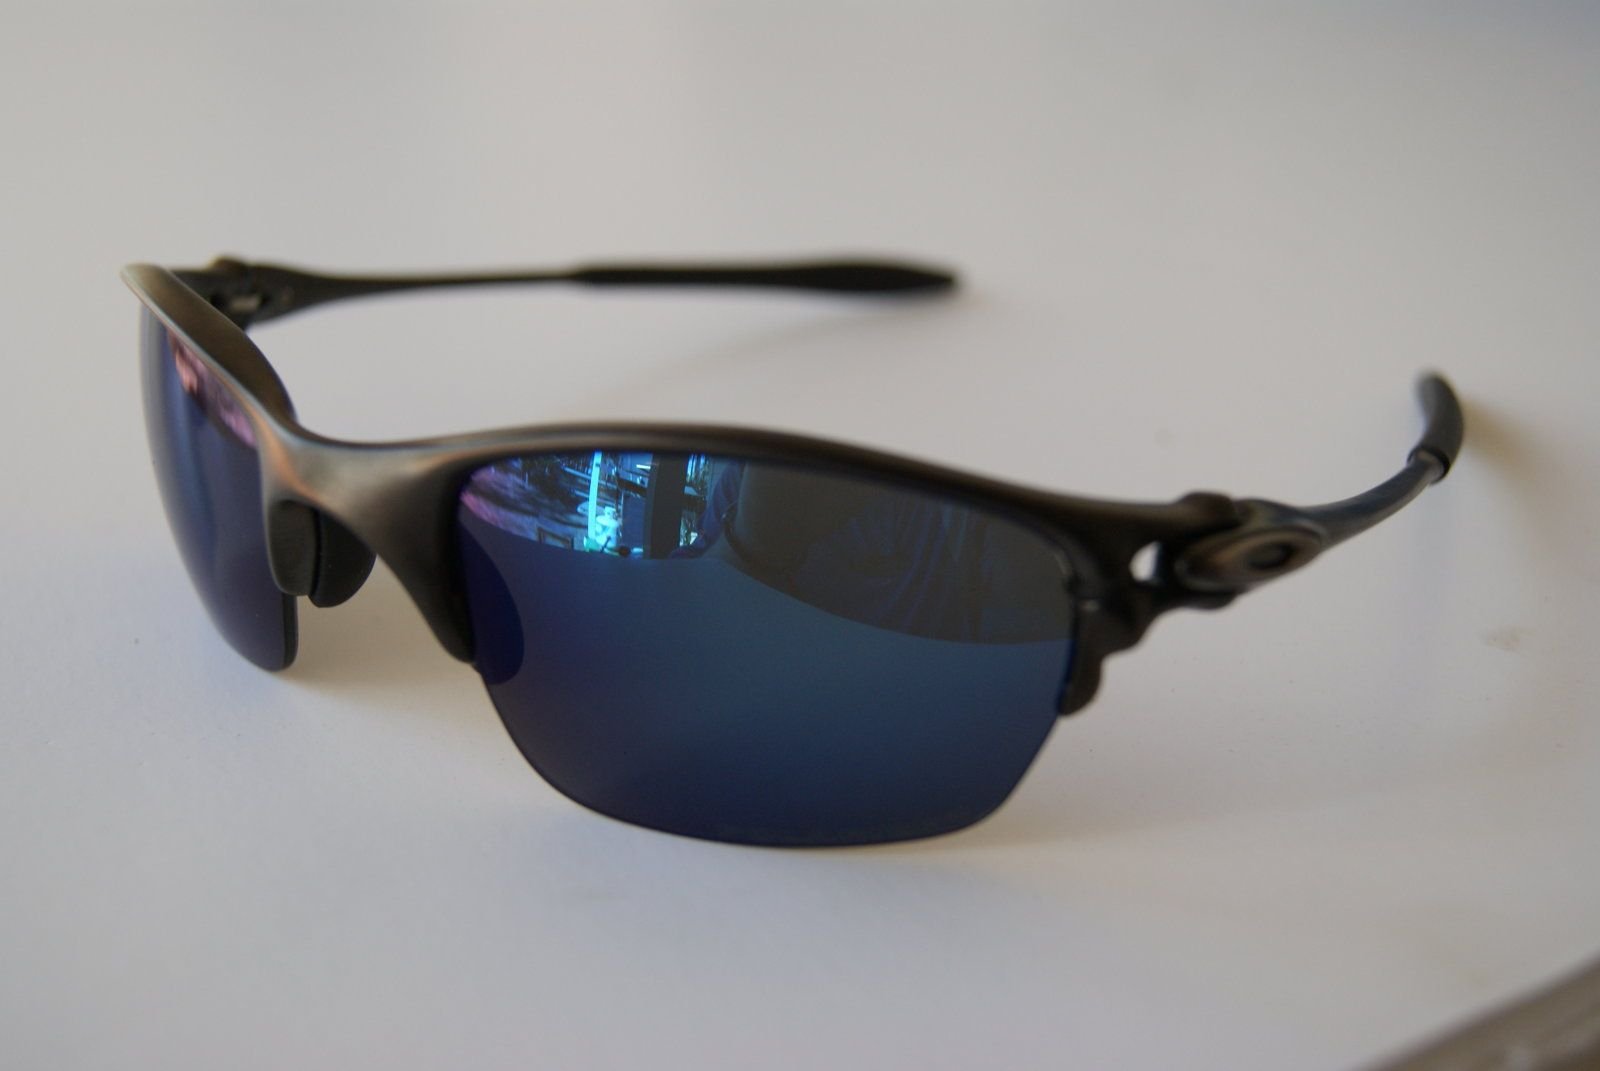 for sale half x carbon blue iridium polarized lenses oakley forum rh oakleyforum com